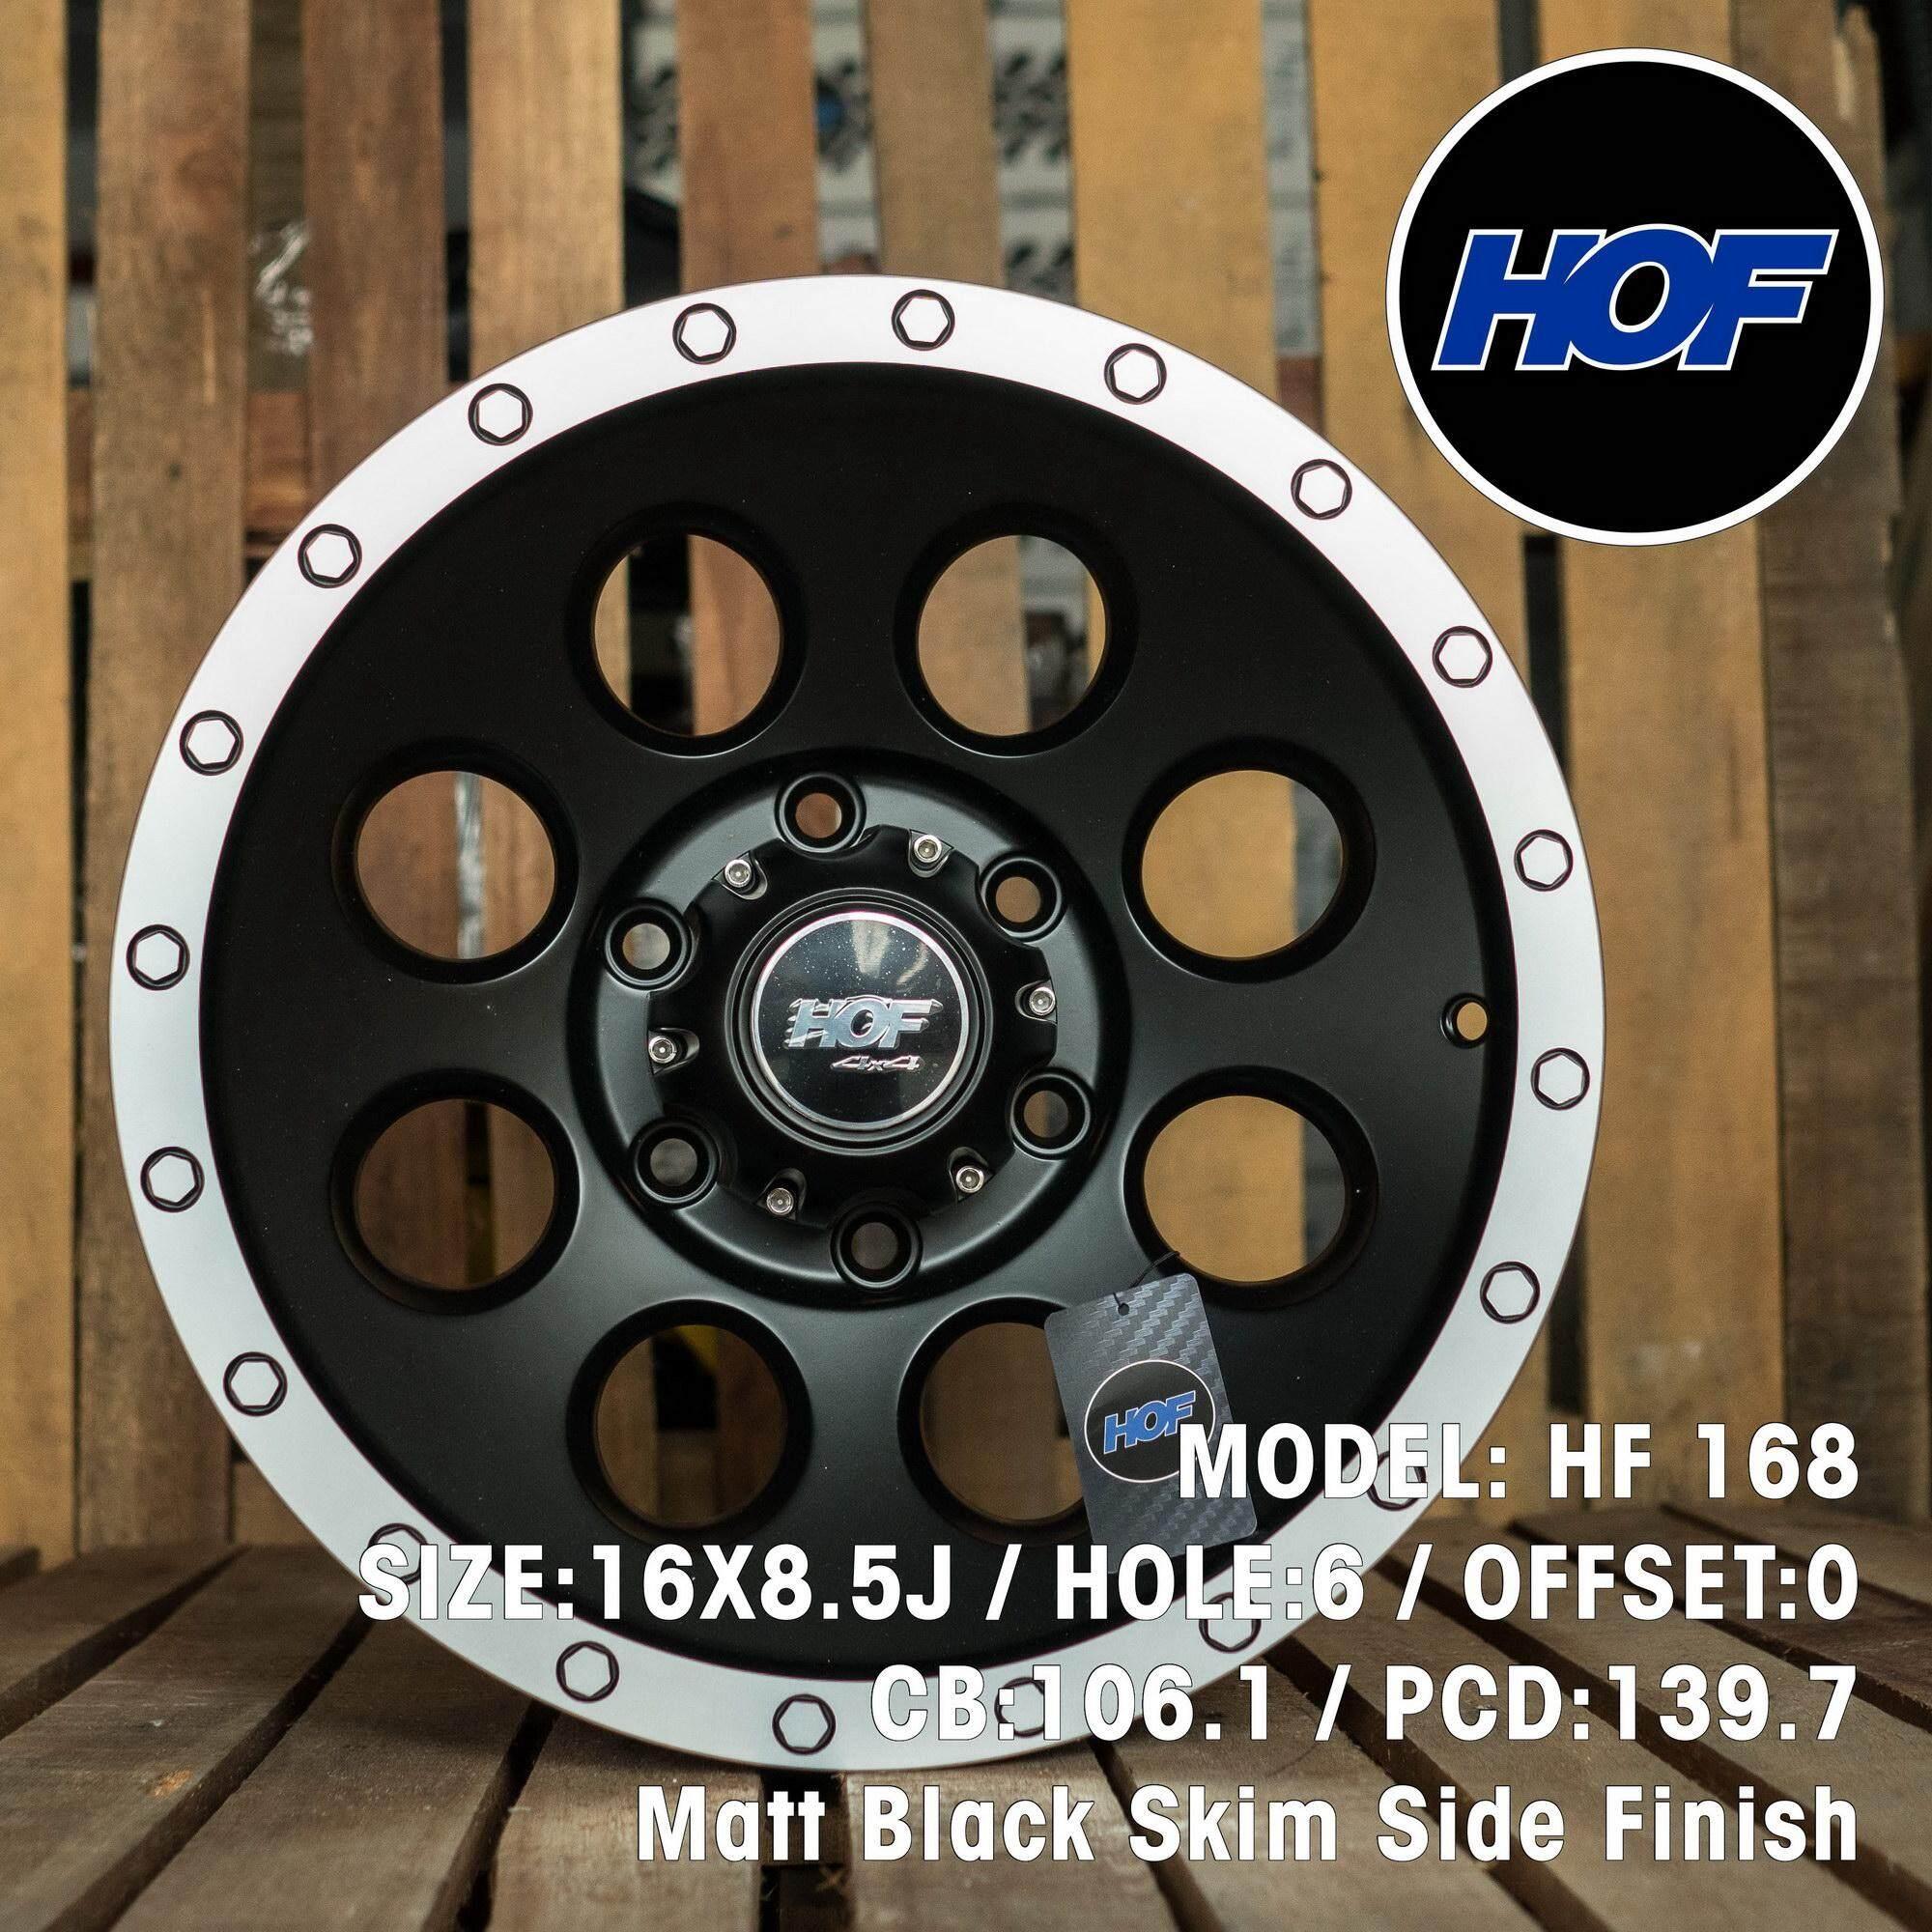 Hof 4x4 Hf168 16x8.5j Matt Black Skim Side Finish By Motareign.